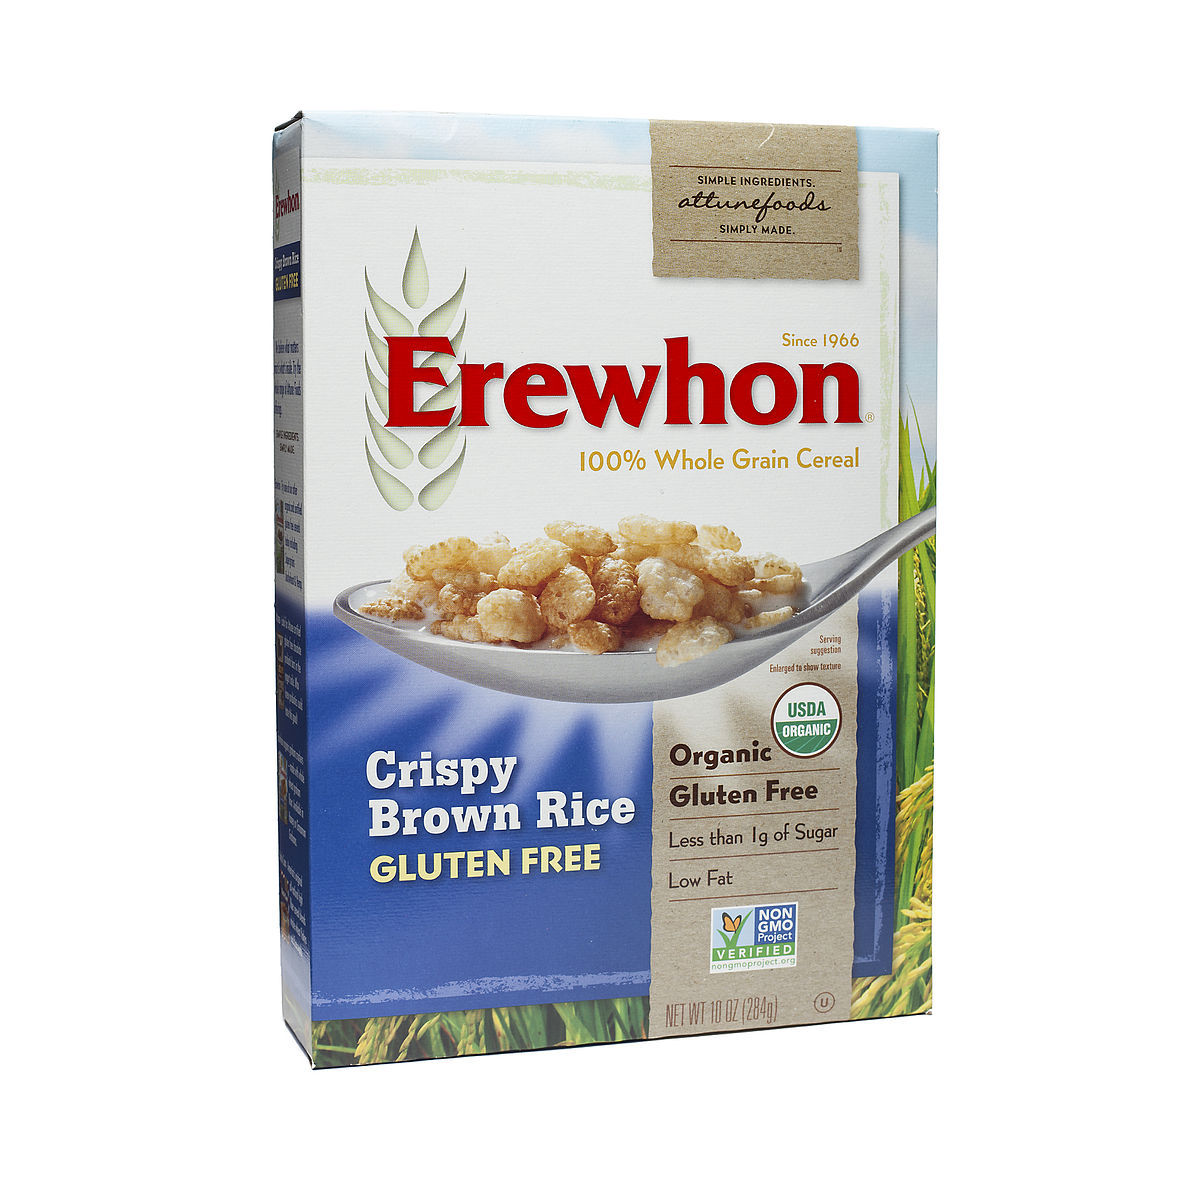 Erewhon crispy brown rice